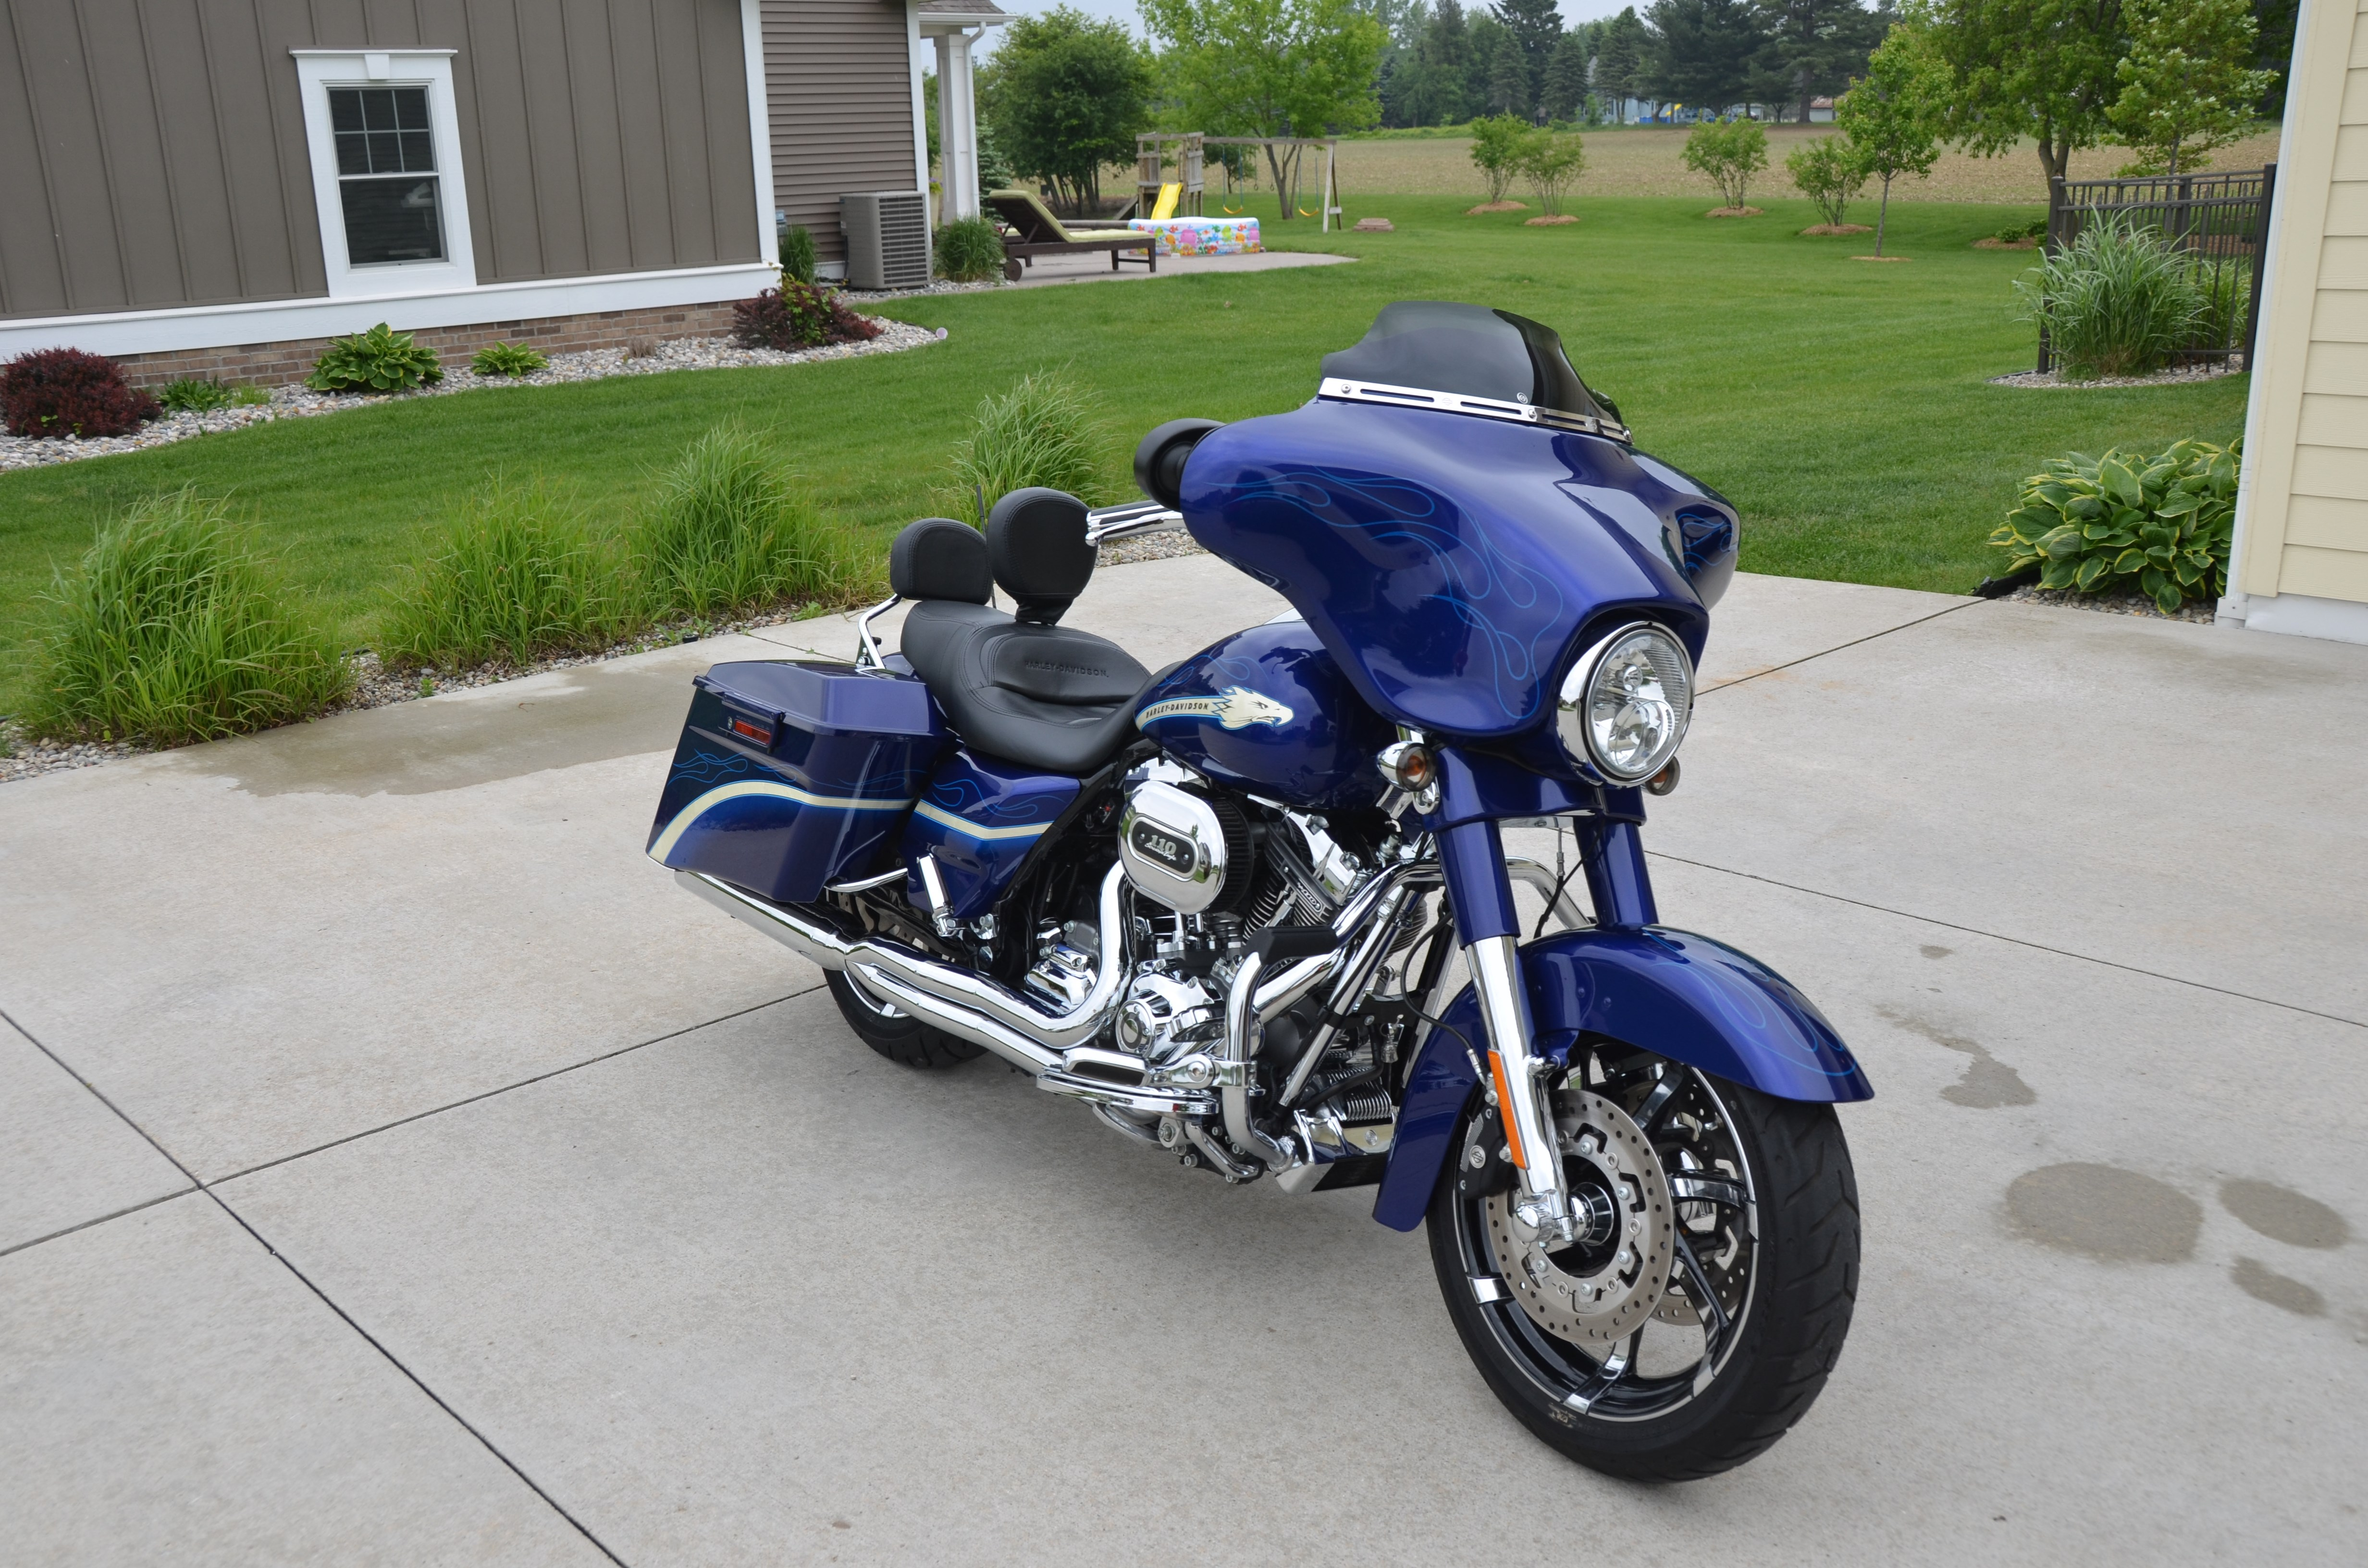 2010 Harley Davidson 174 Flhxse Cvo Street Glide 174 Candy